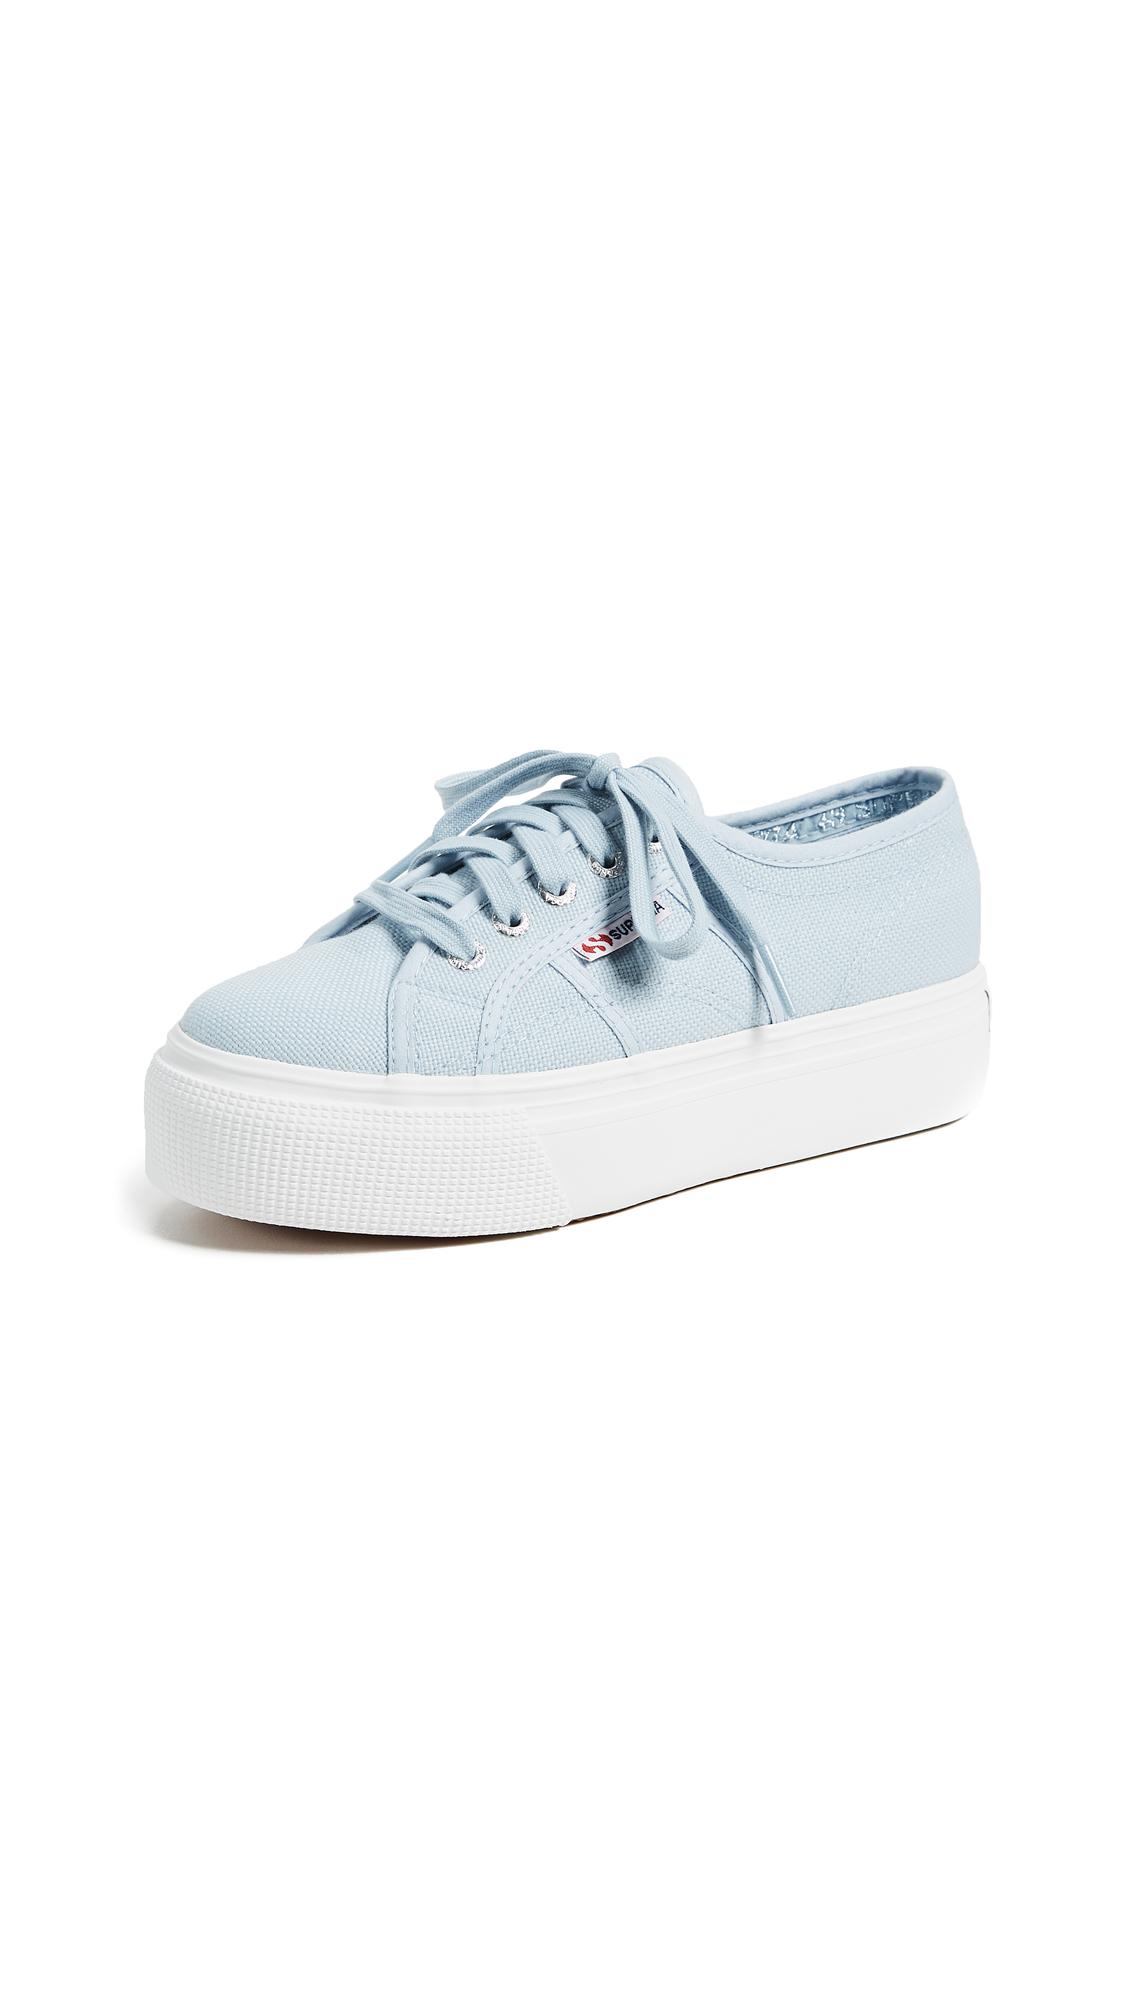 Superga 2790 Platform Sneakers - Dusty Blue